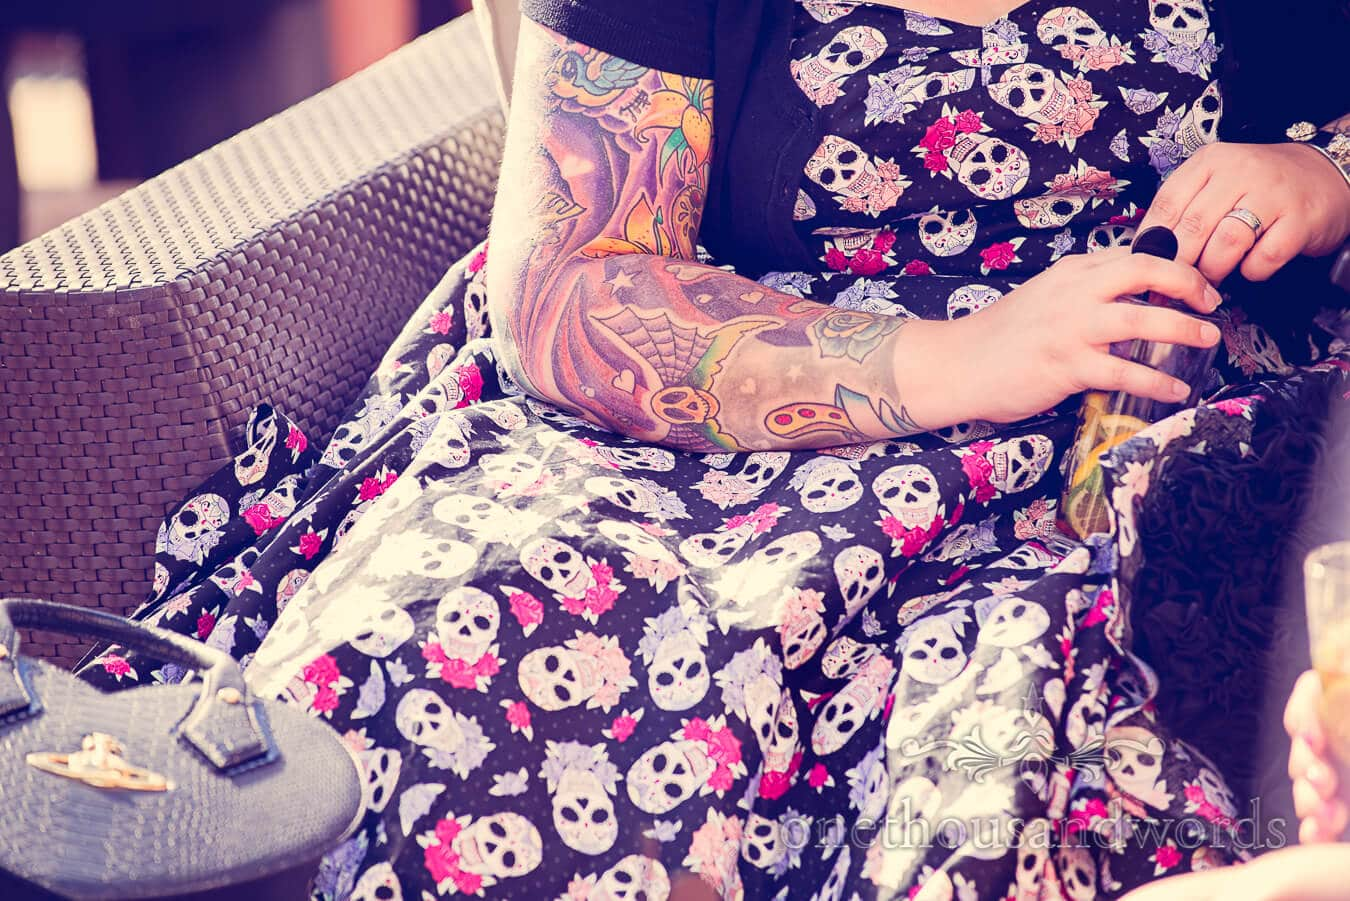 Weddign guest tatoos and sugar skull dress at Poole wedding venue